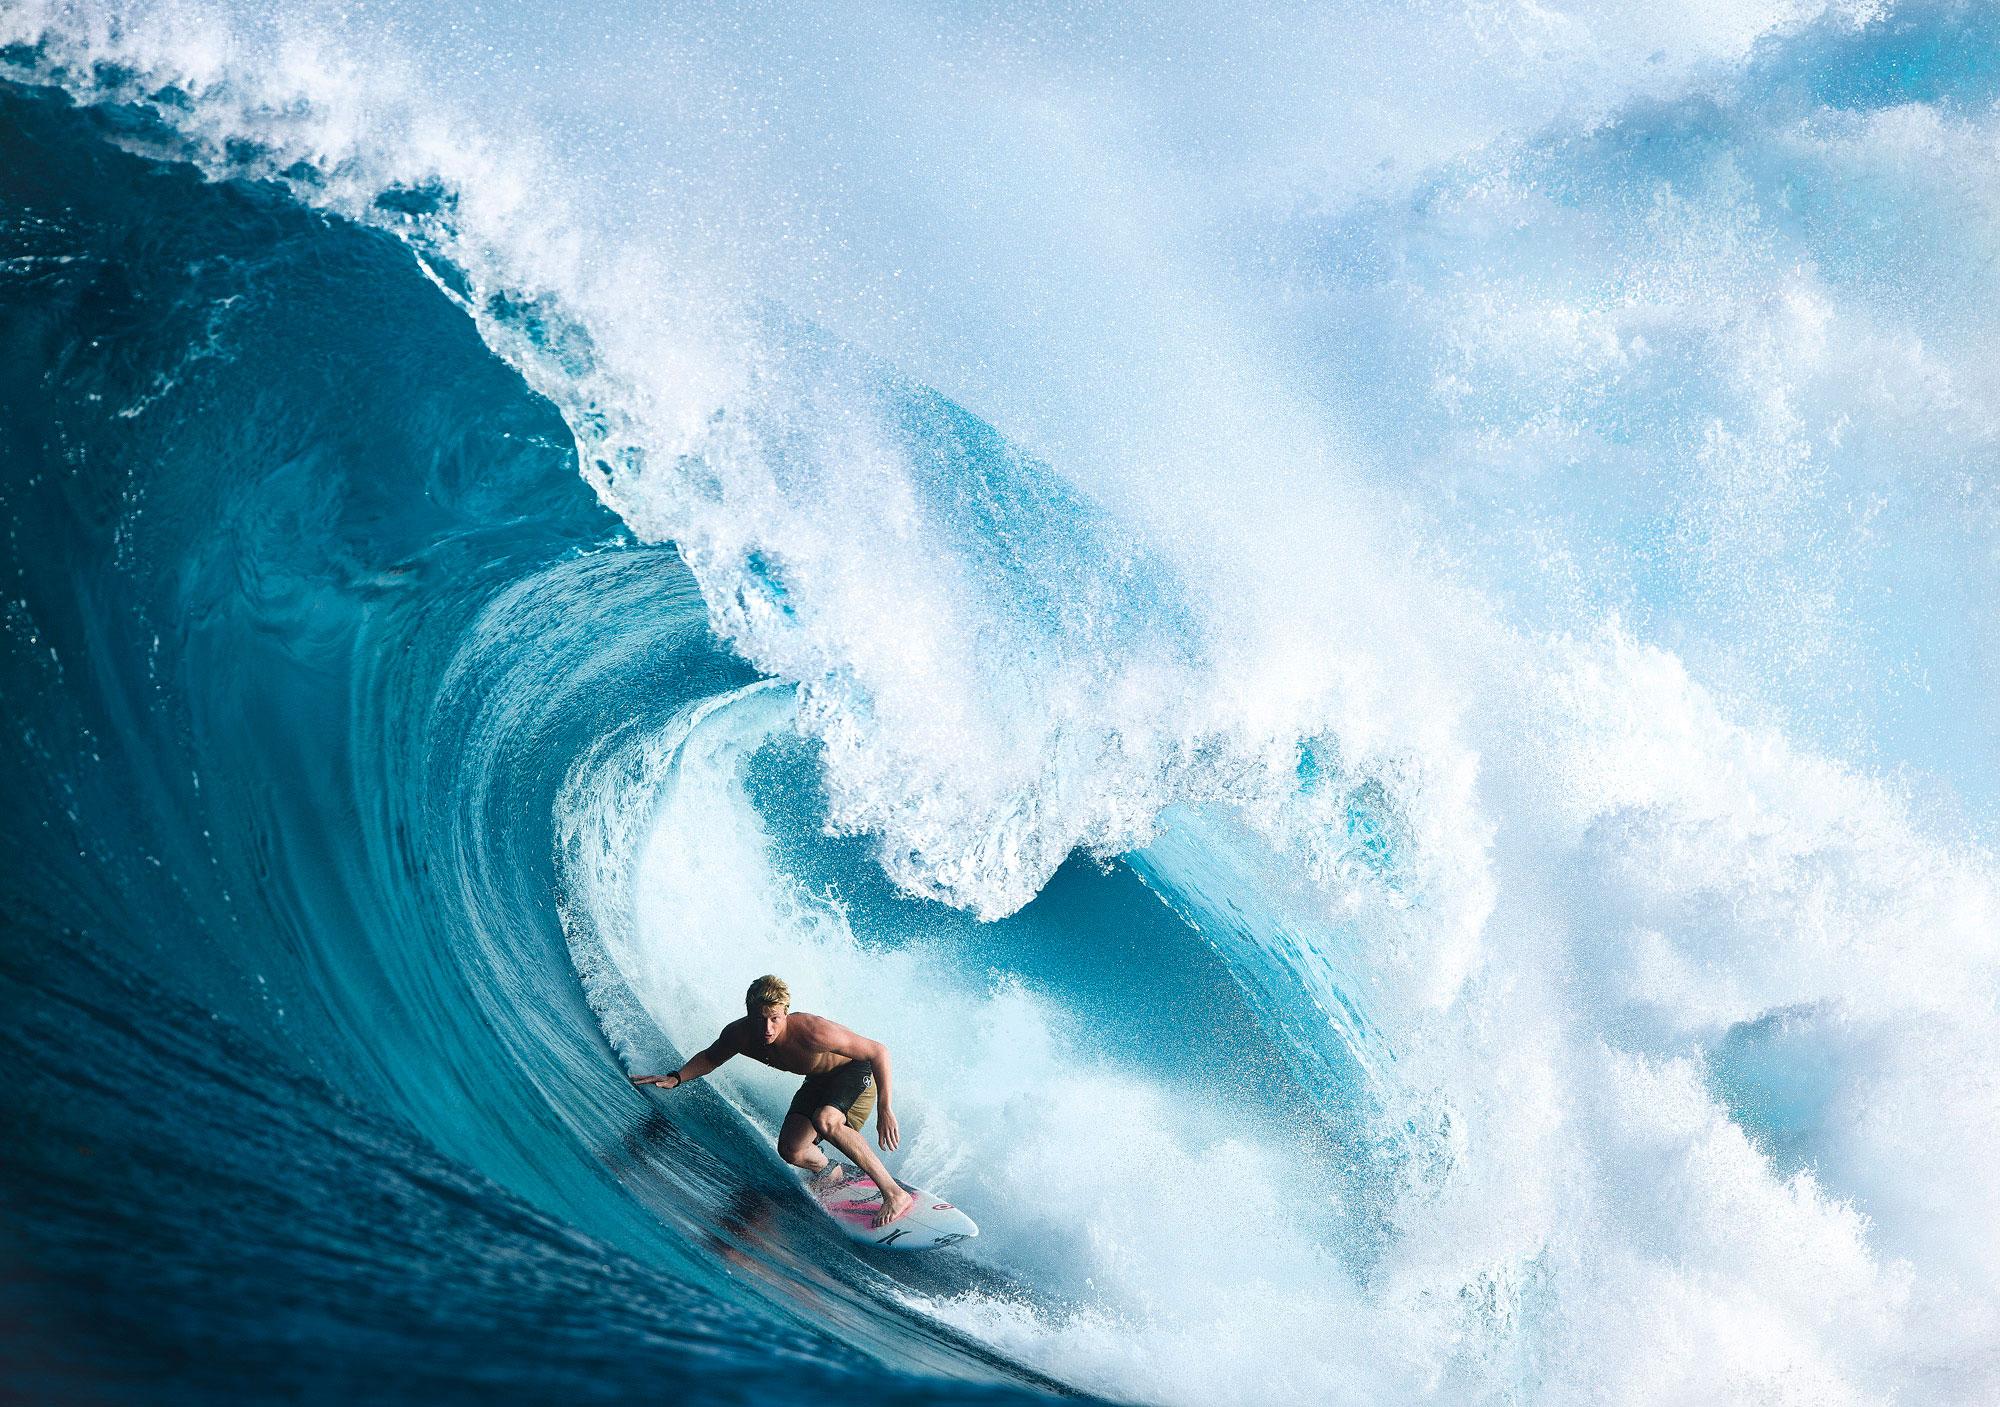 Computer Wallpaper Beach Hipster Quotes Free Hd Surfing Backgrounds Pixelstalk Net